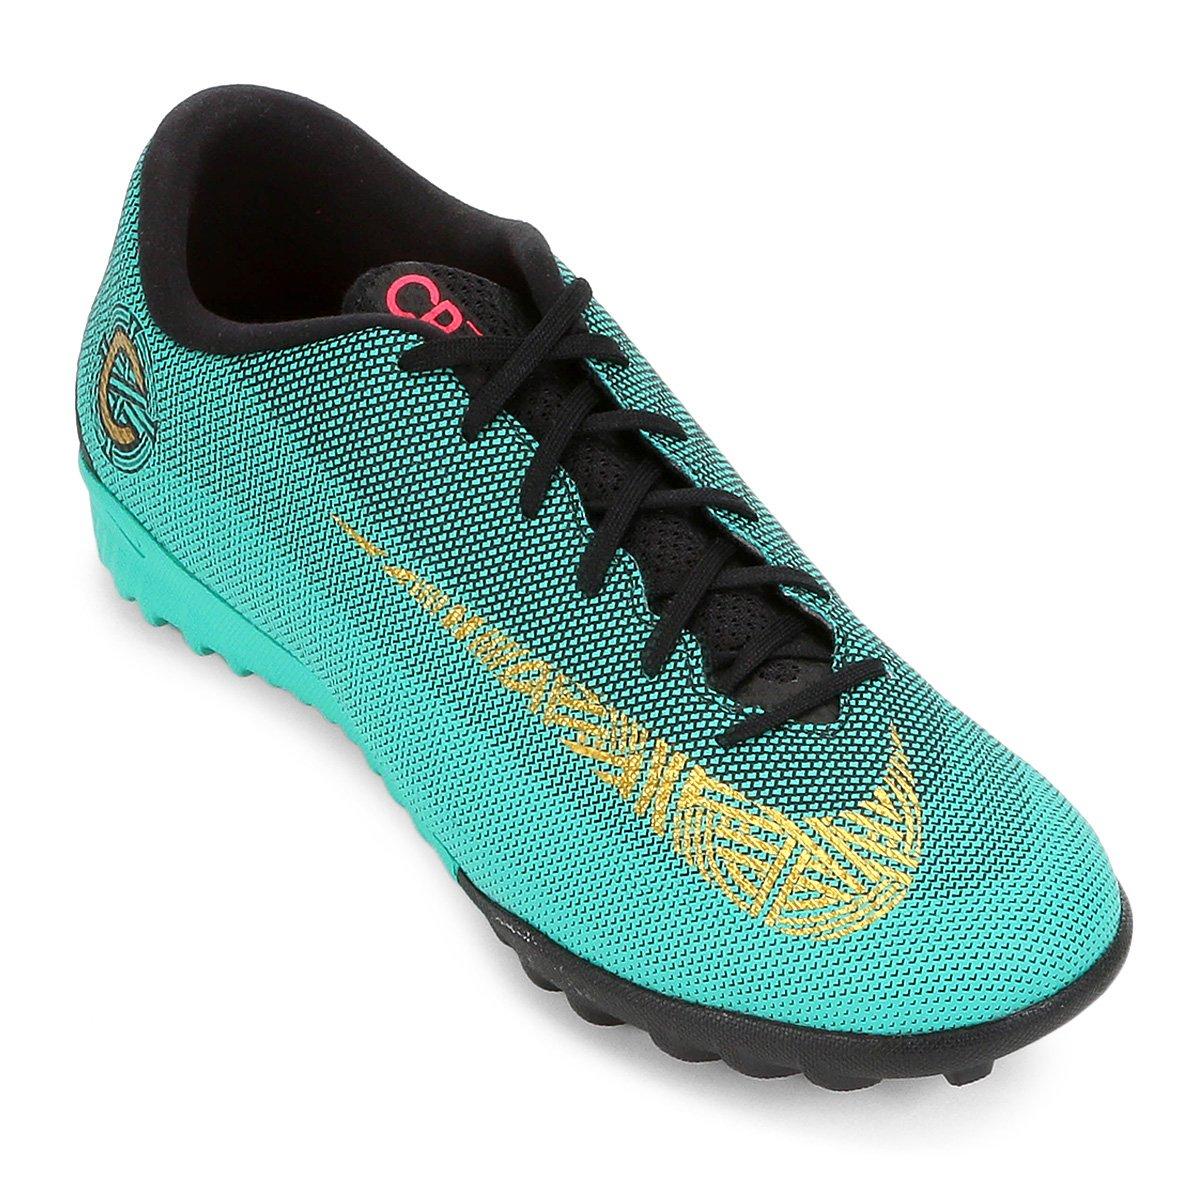 Chuteira Society Nike Mercurial Vapor 12 Academy CR7 TF - Compre Agora  98ffcad528ce1